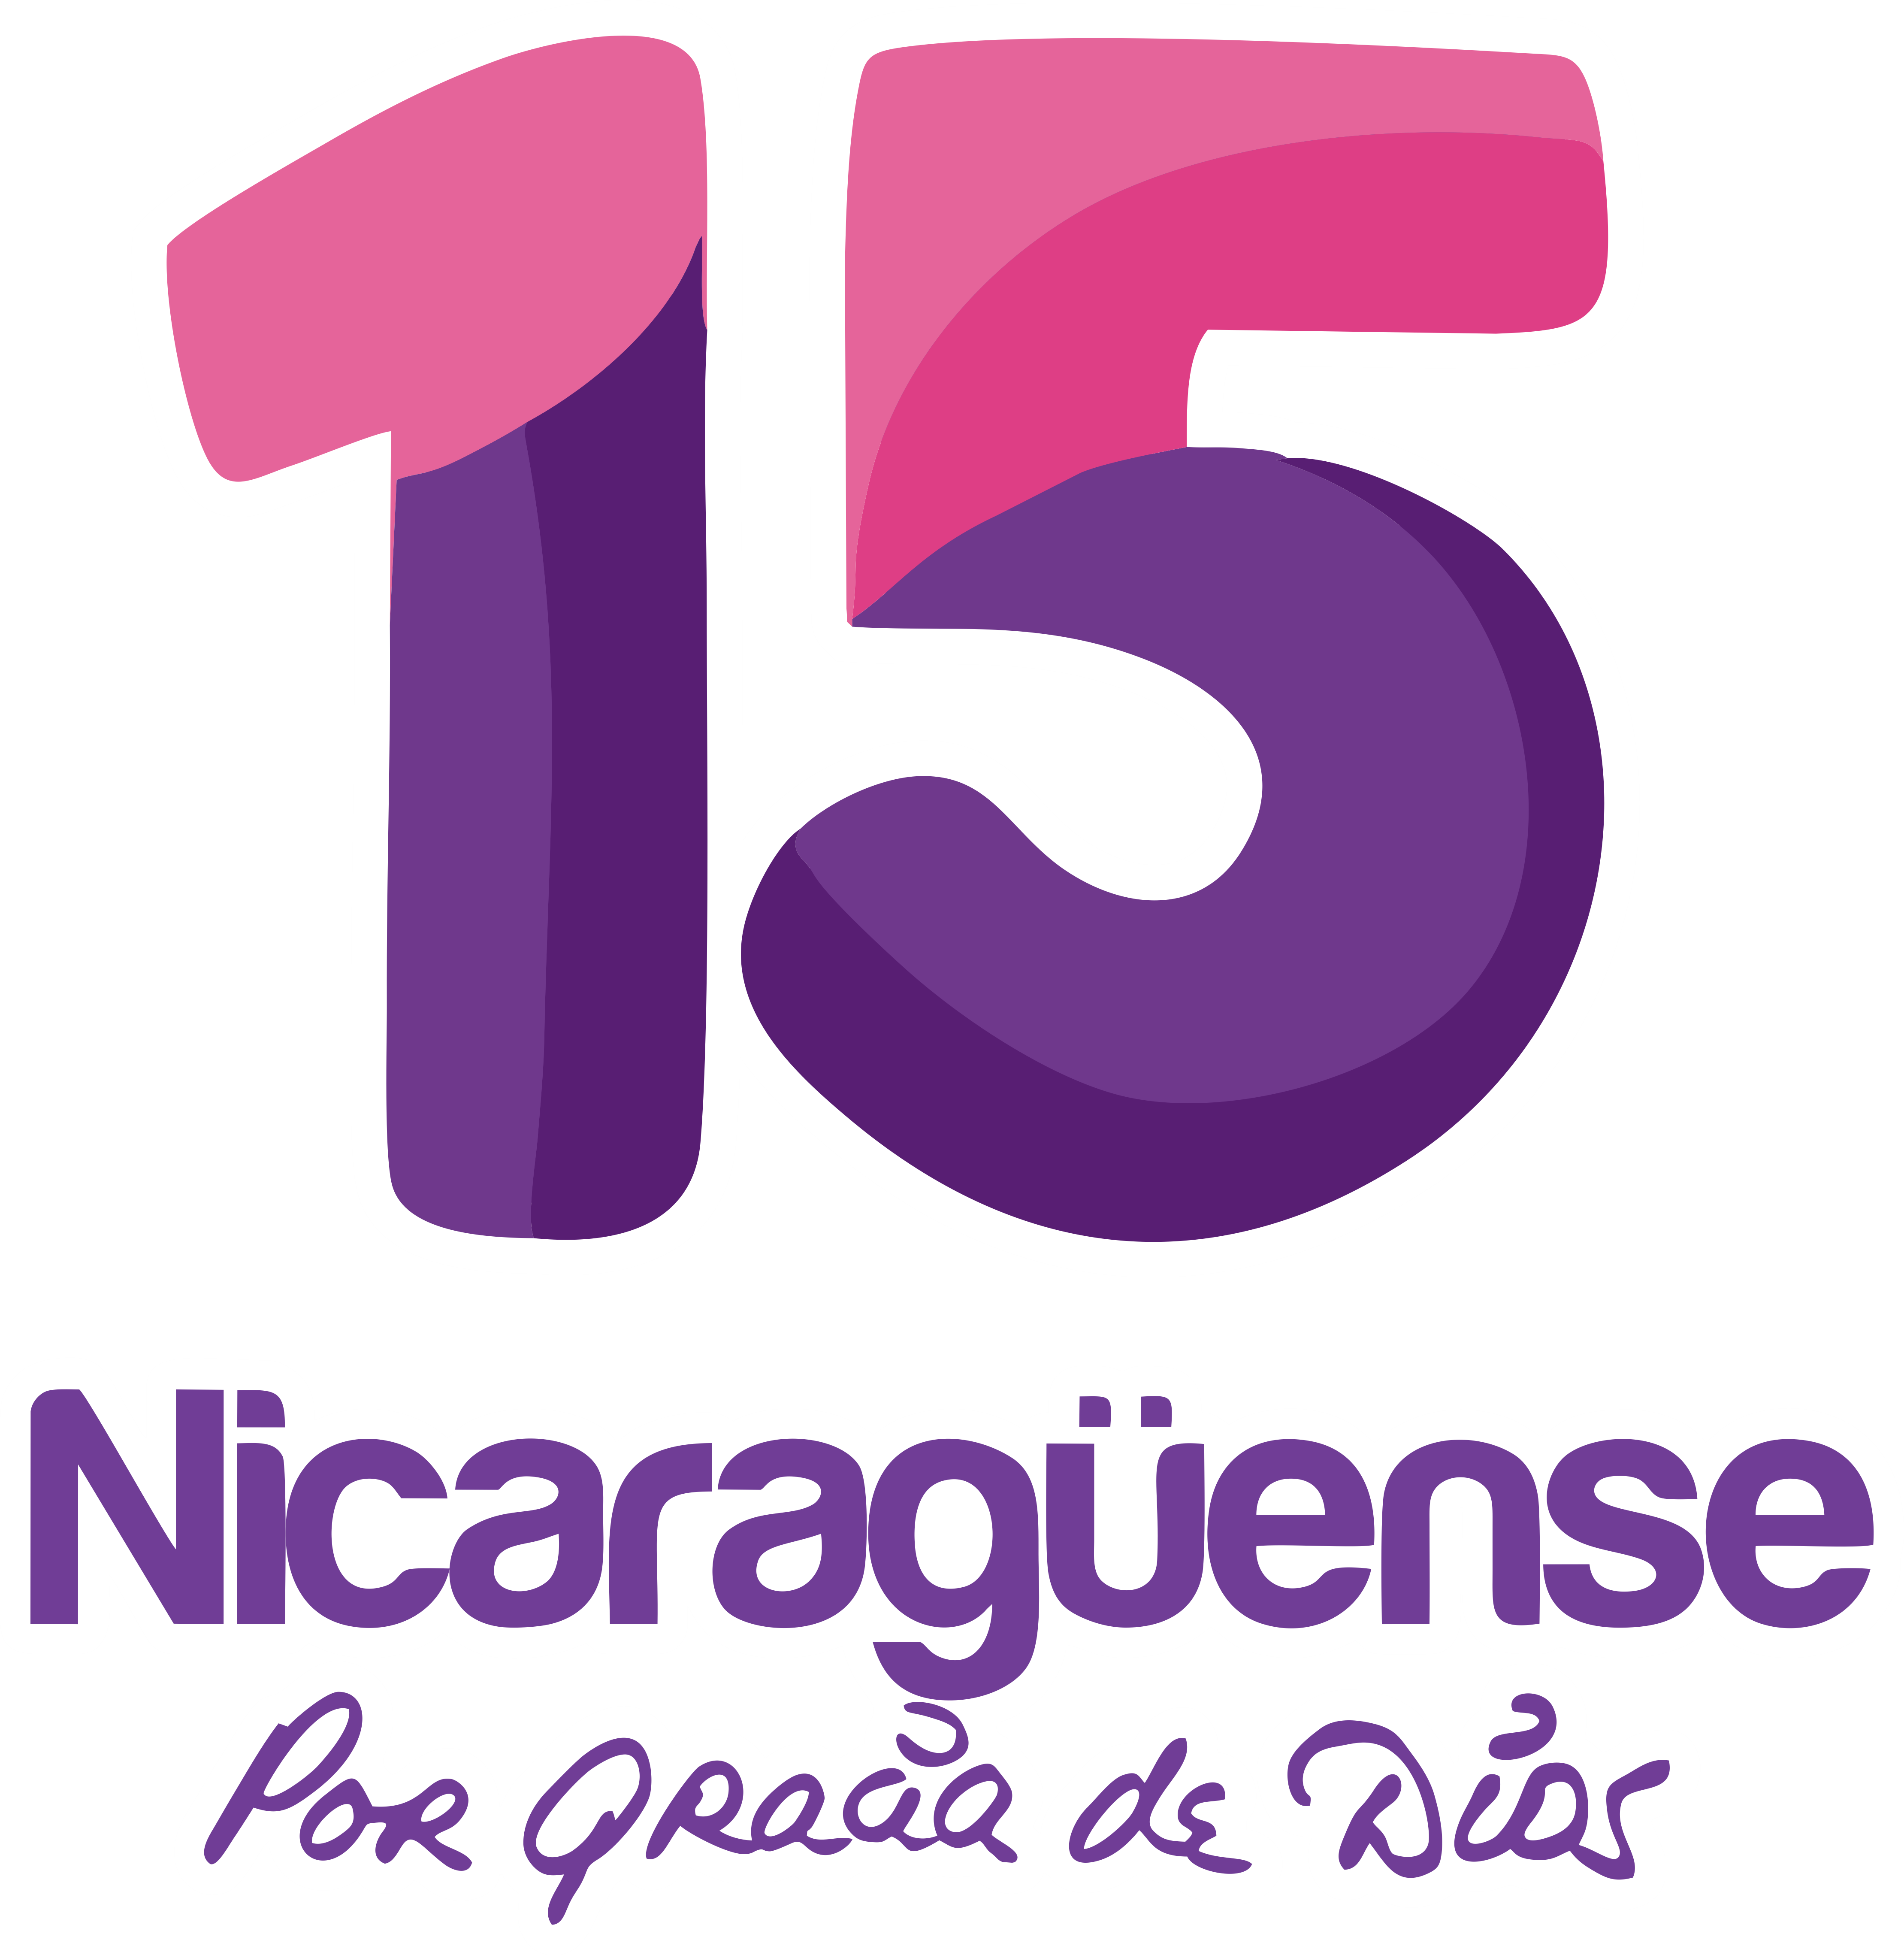 Canal 15 (Nicaragua)